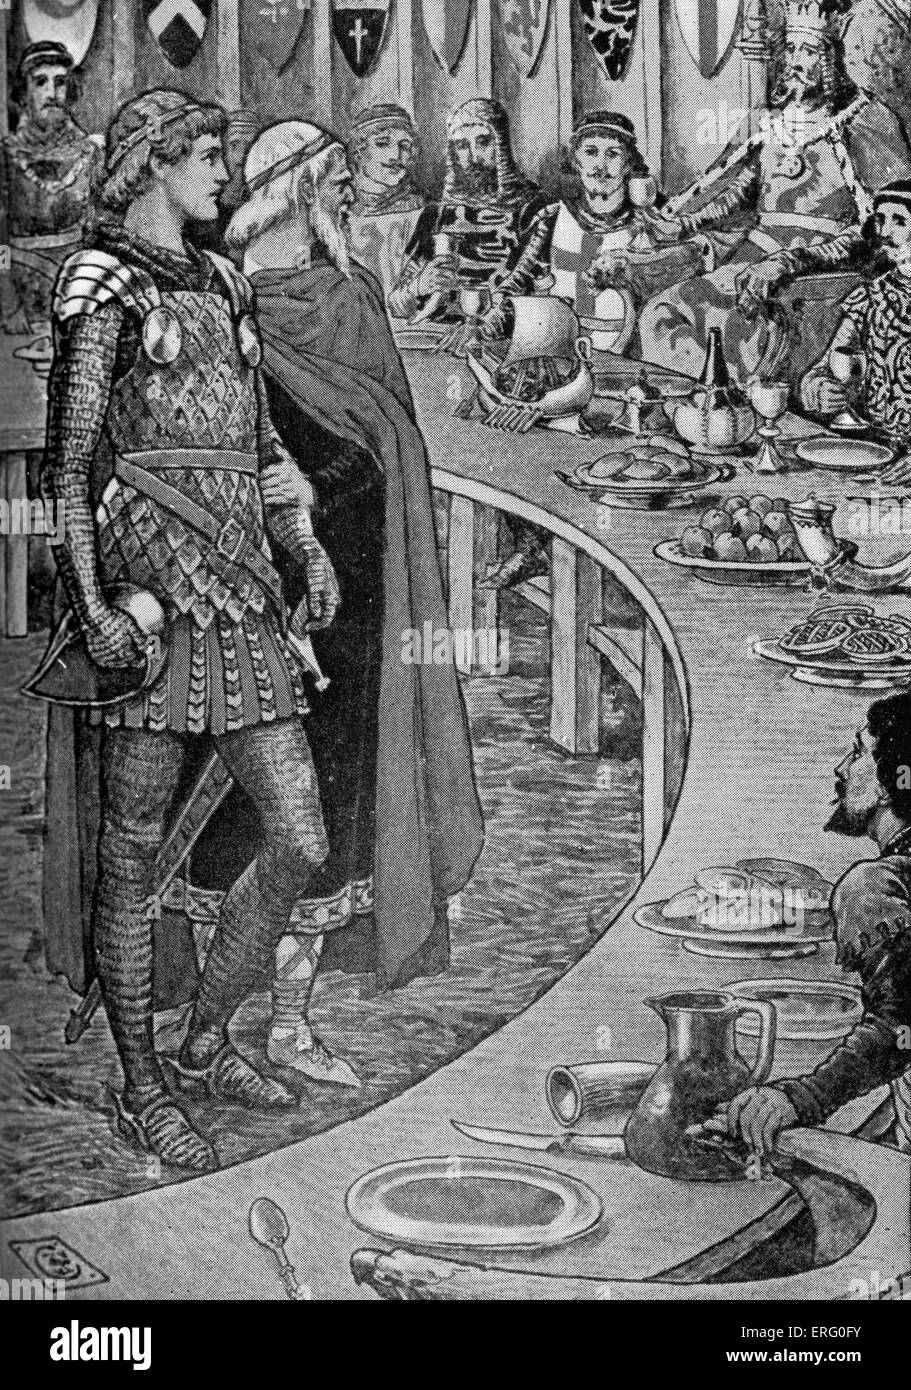 king arthur an old man presents sir galahad to king arthur from